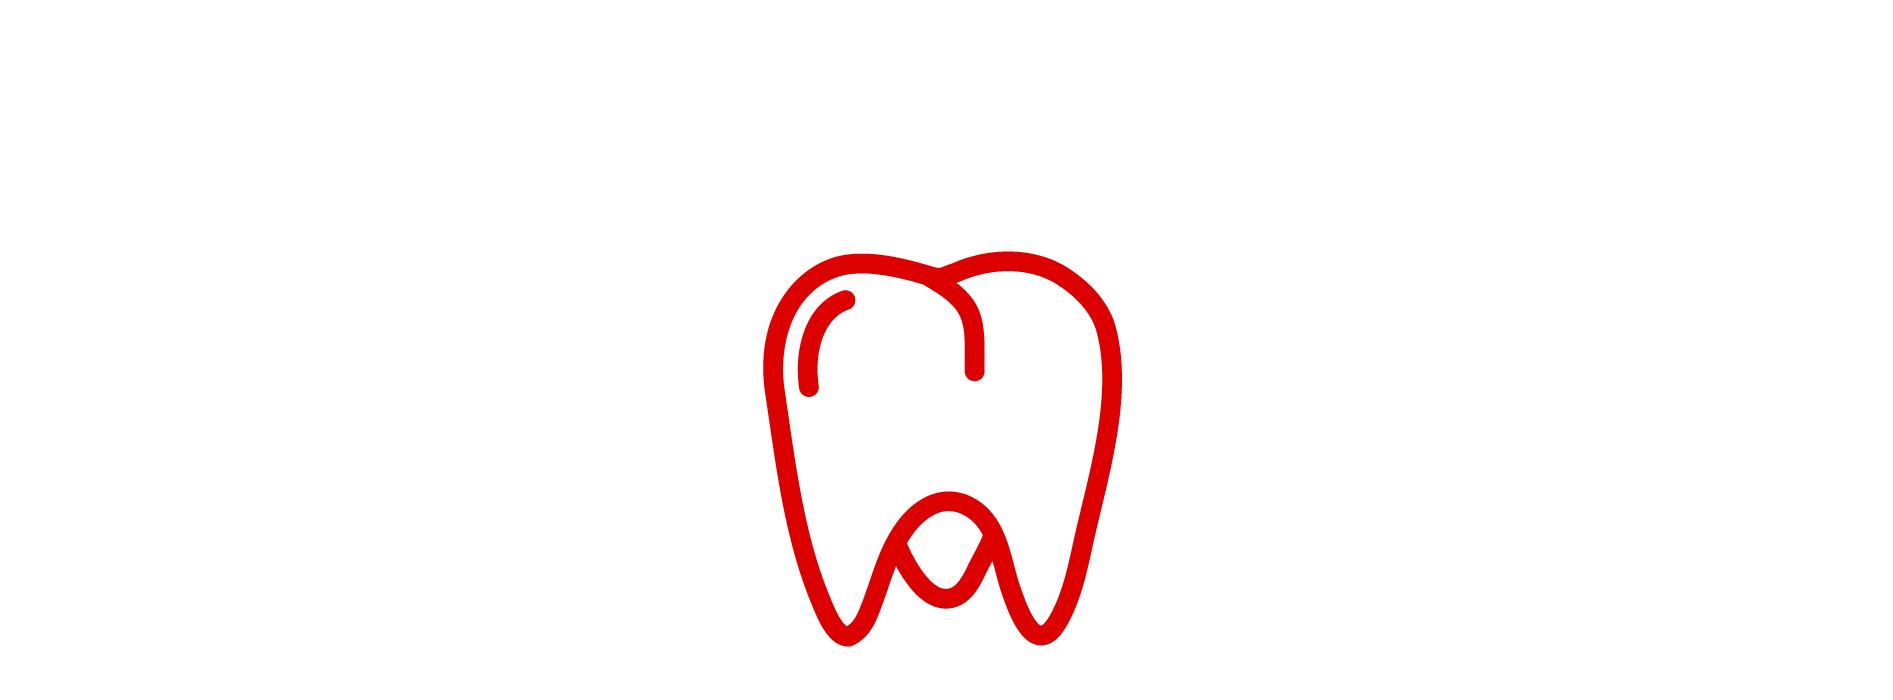 $519,000 - dental services